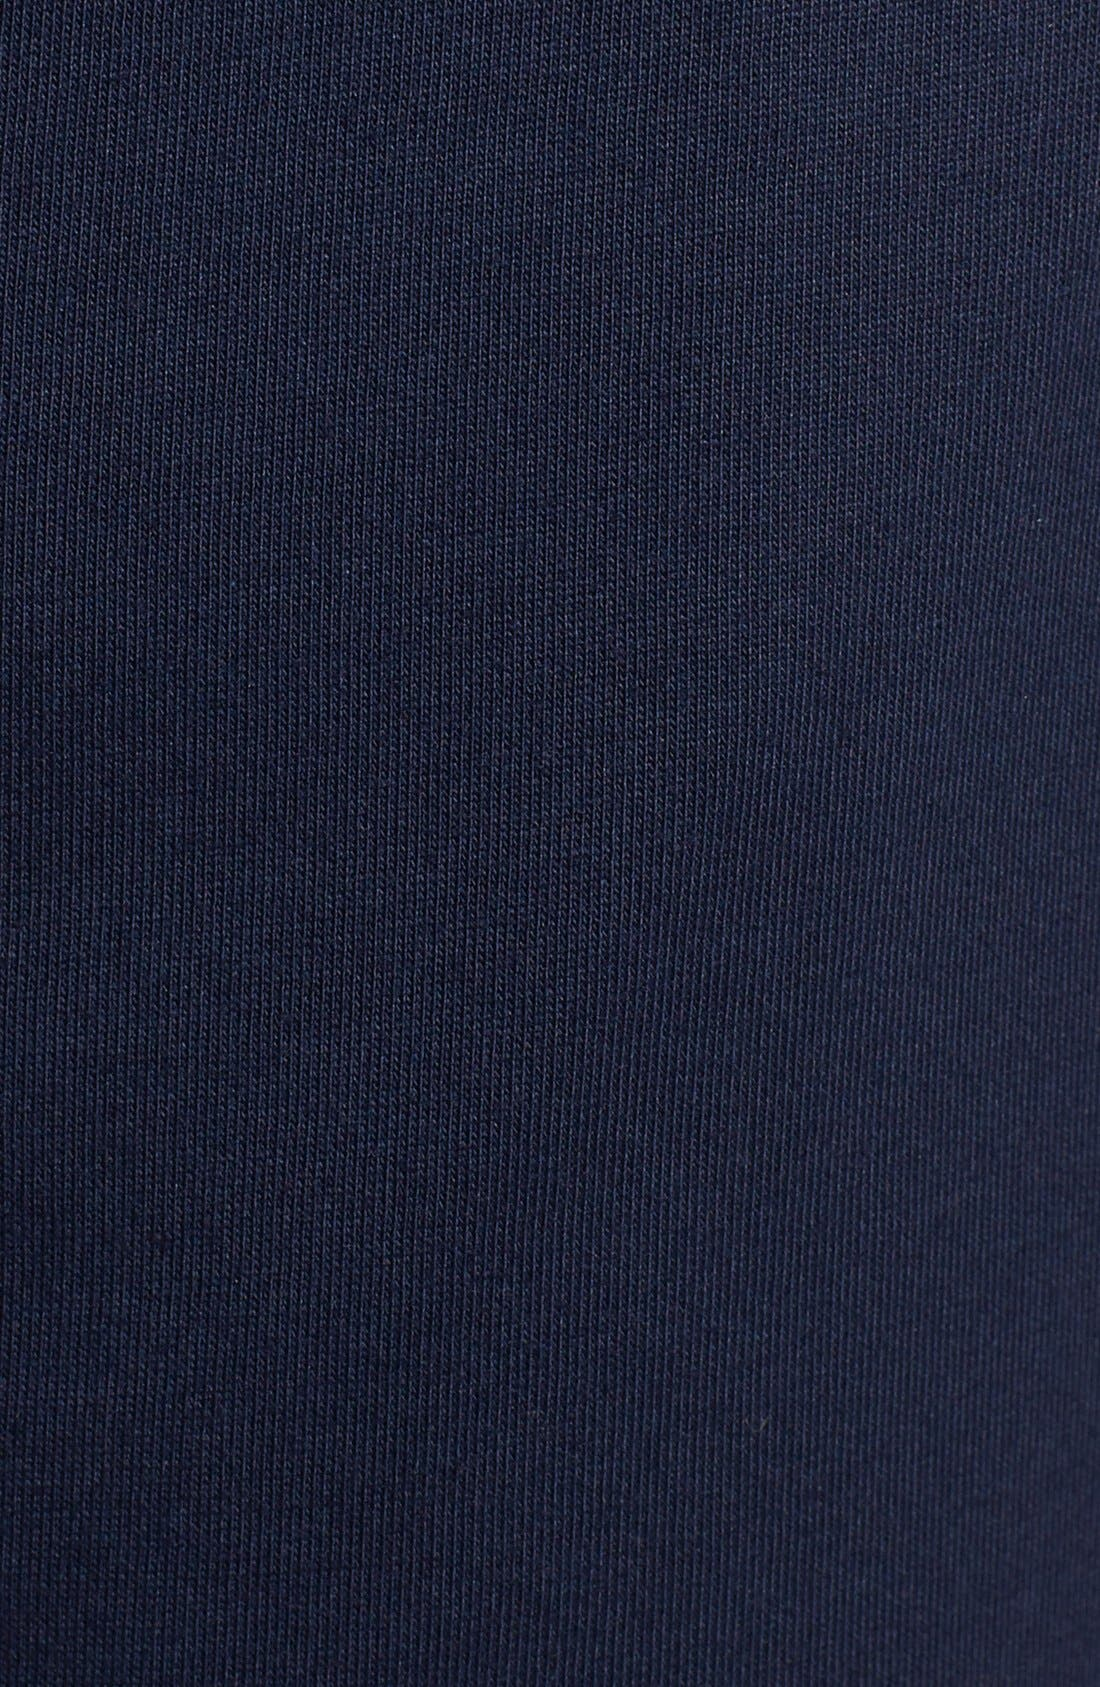 Alternate Image 3  - Polo Ralph Lauren Pajama Pants